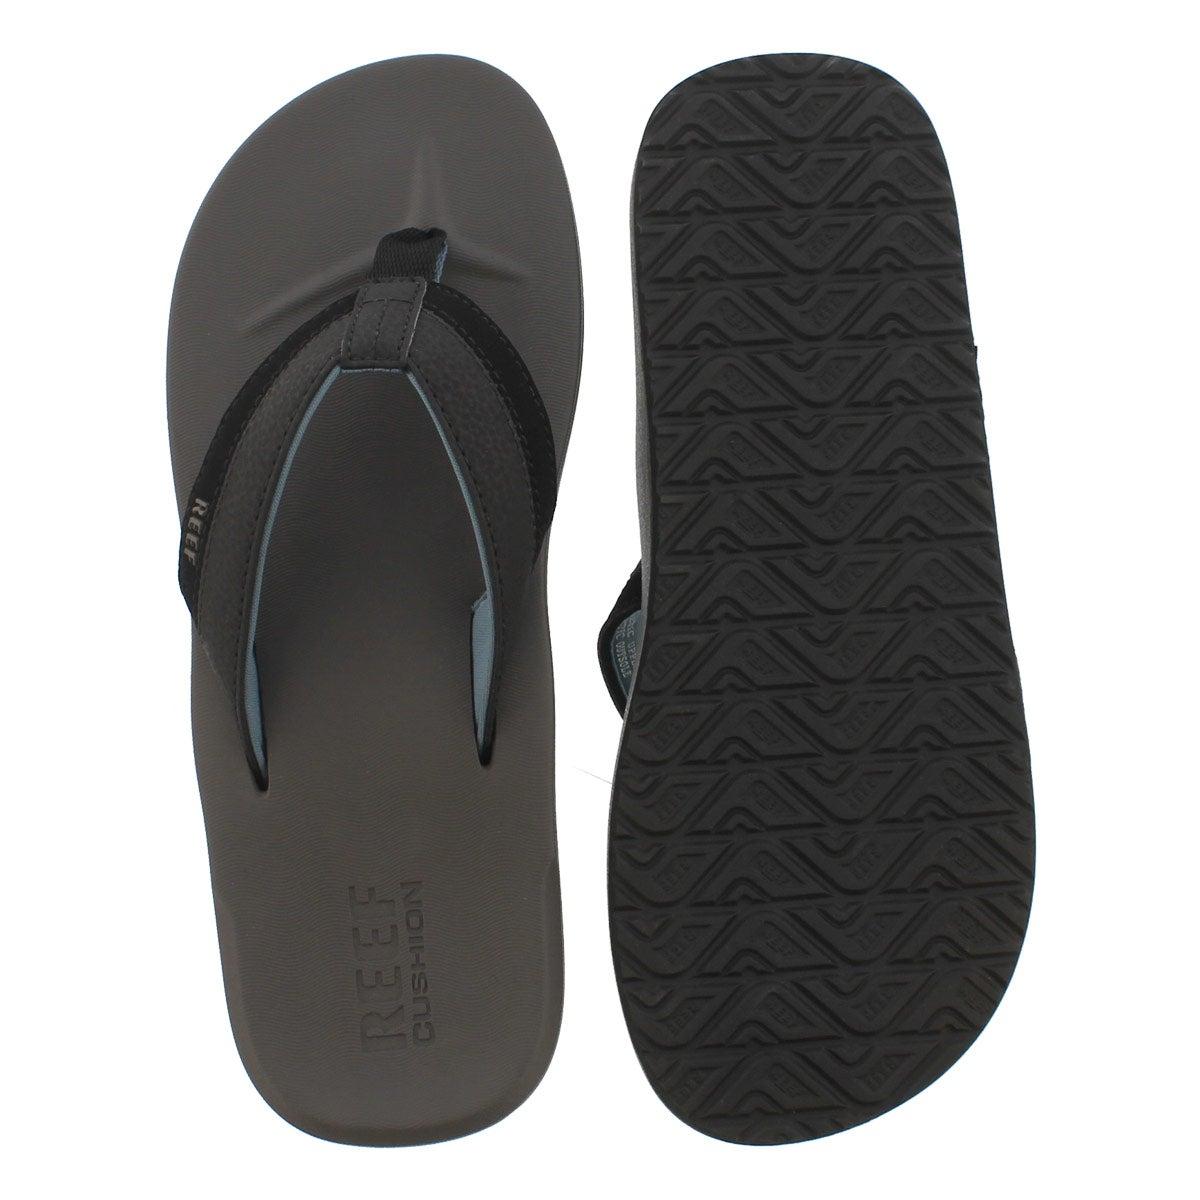 Mns ContouredCushion gy/blu thong sandal